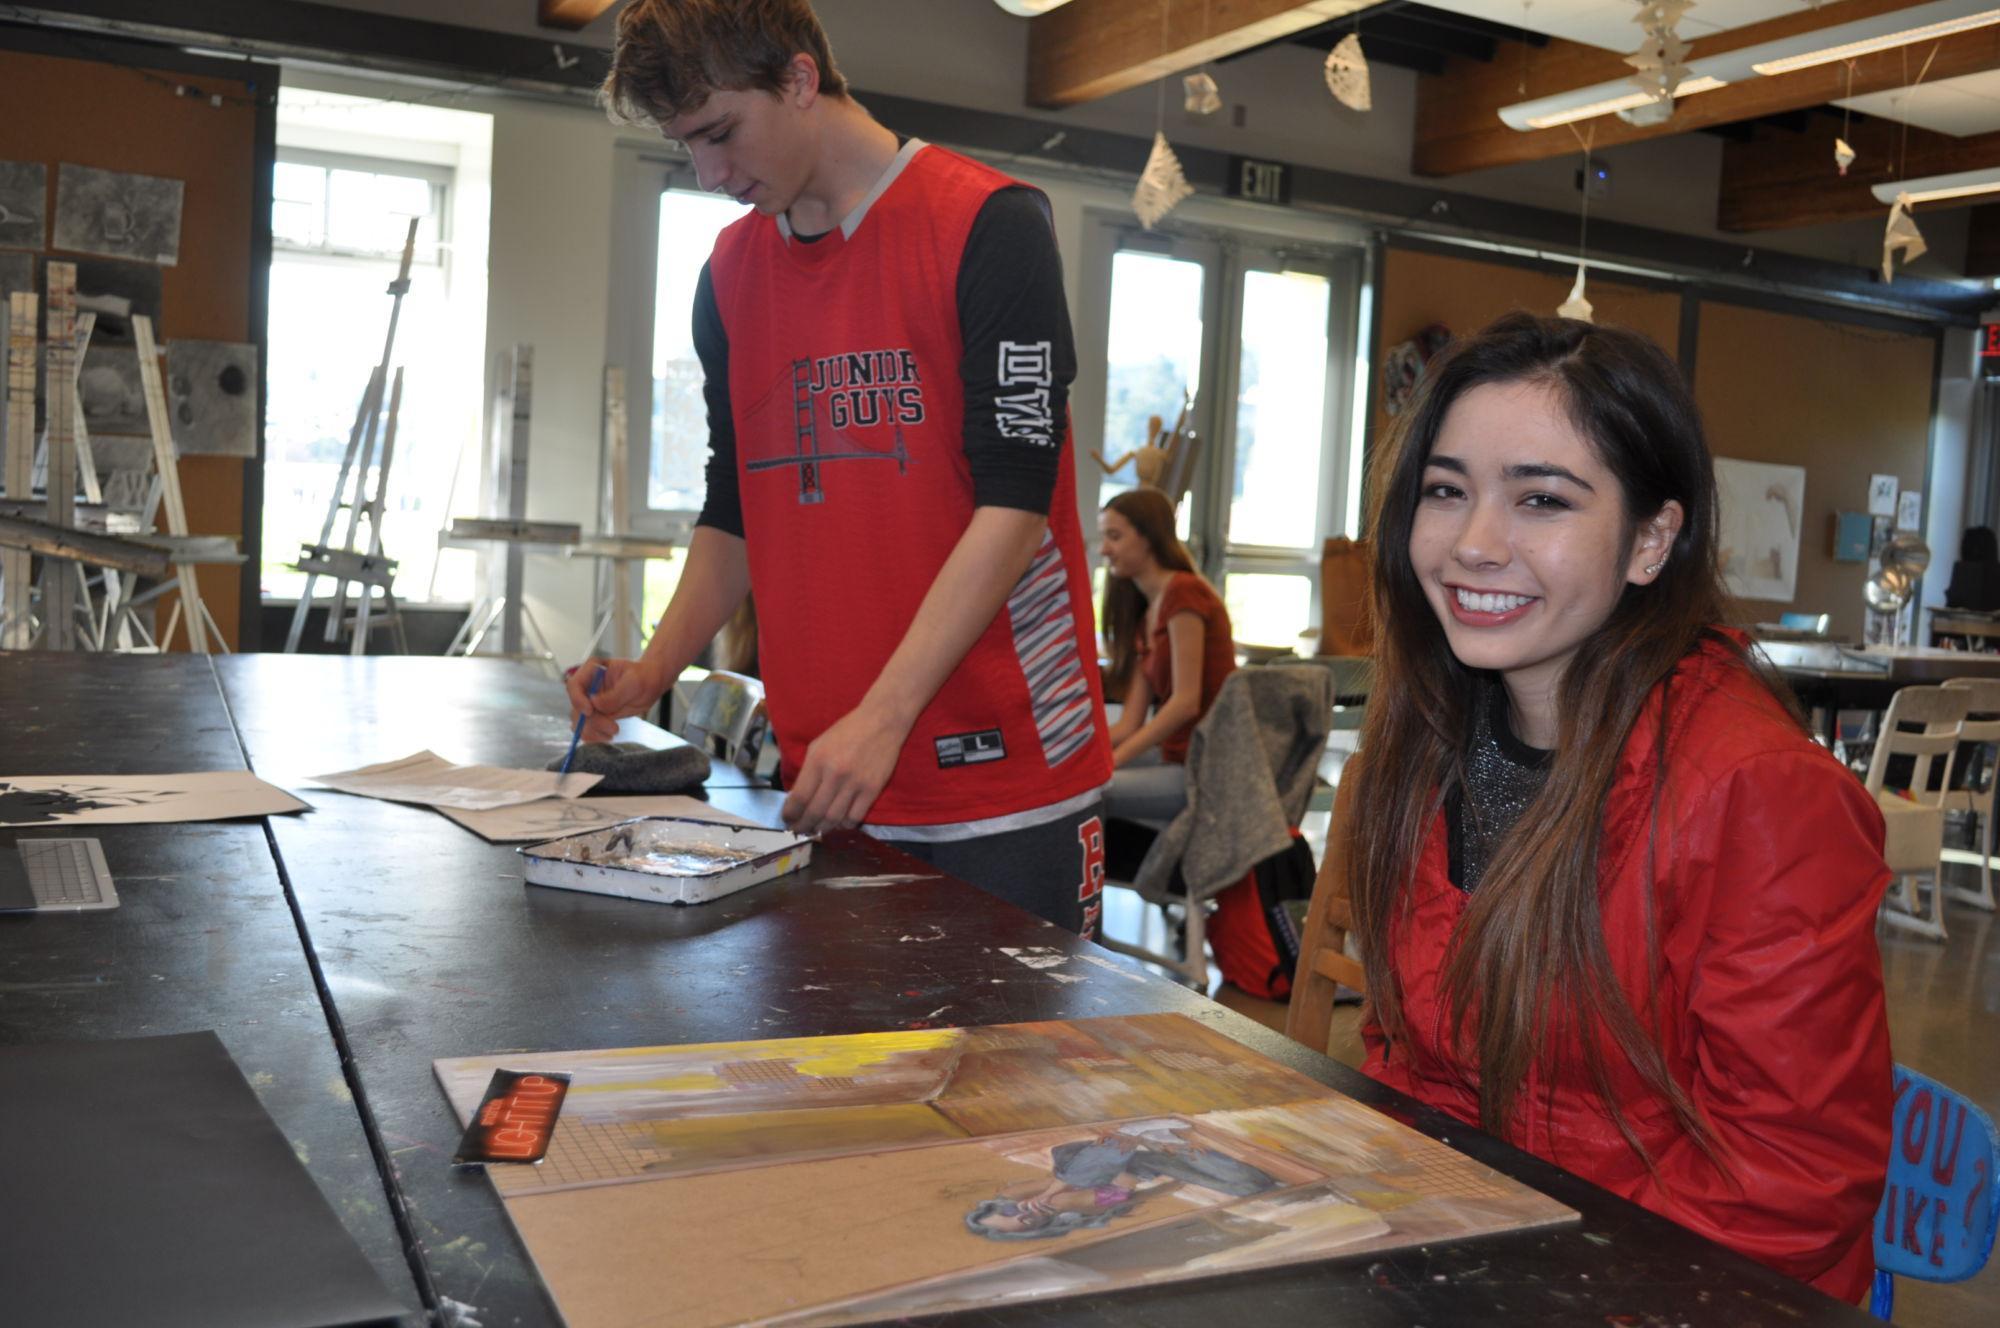 Junior Eileen Bettinger works on a project in AP Studio Art Class